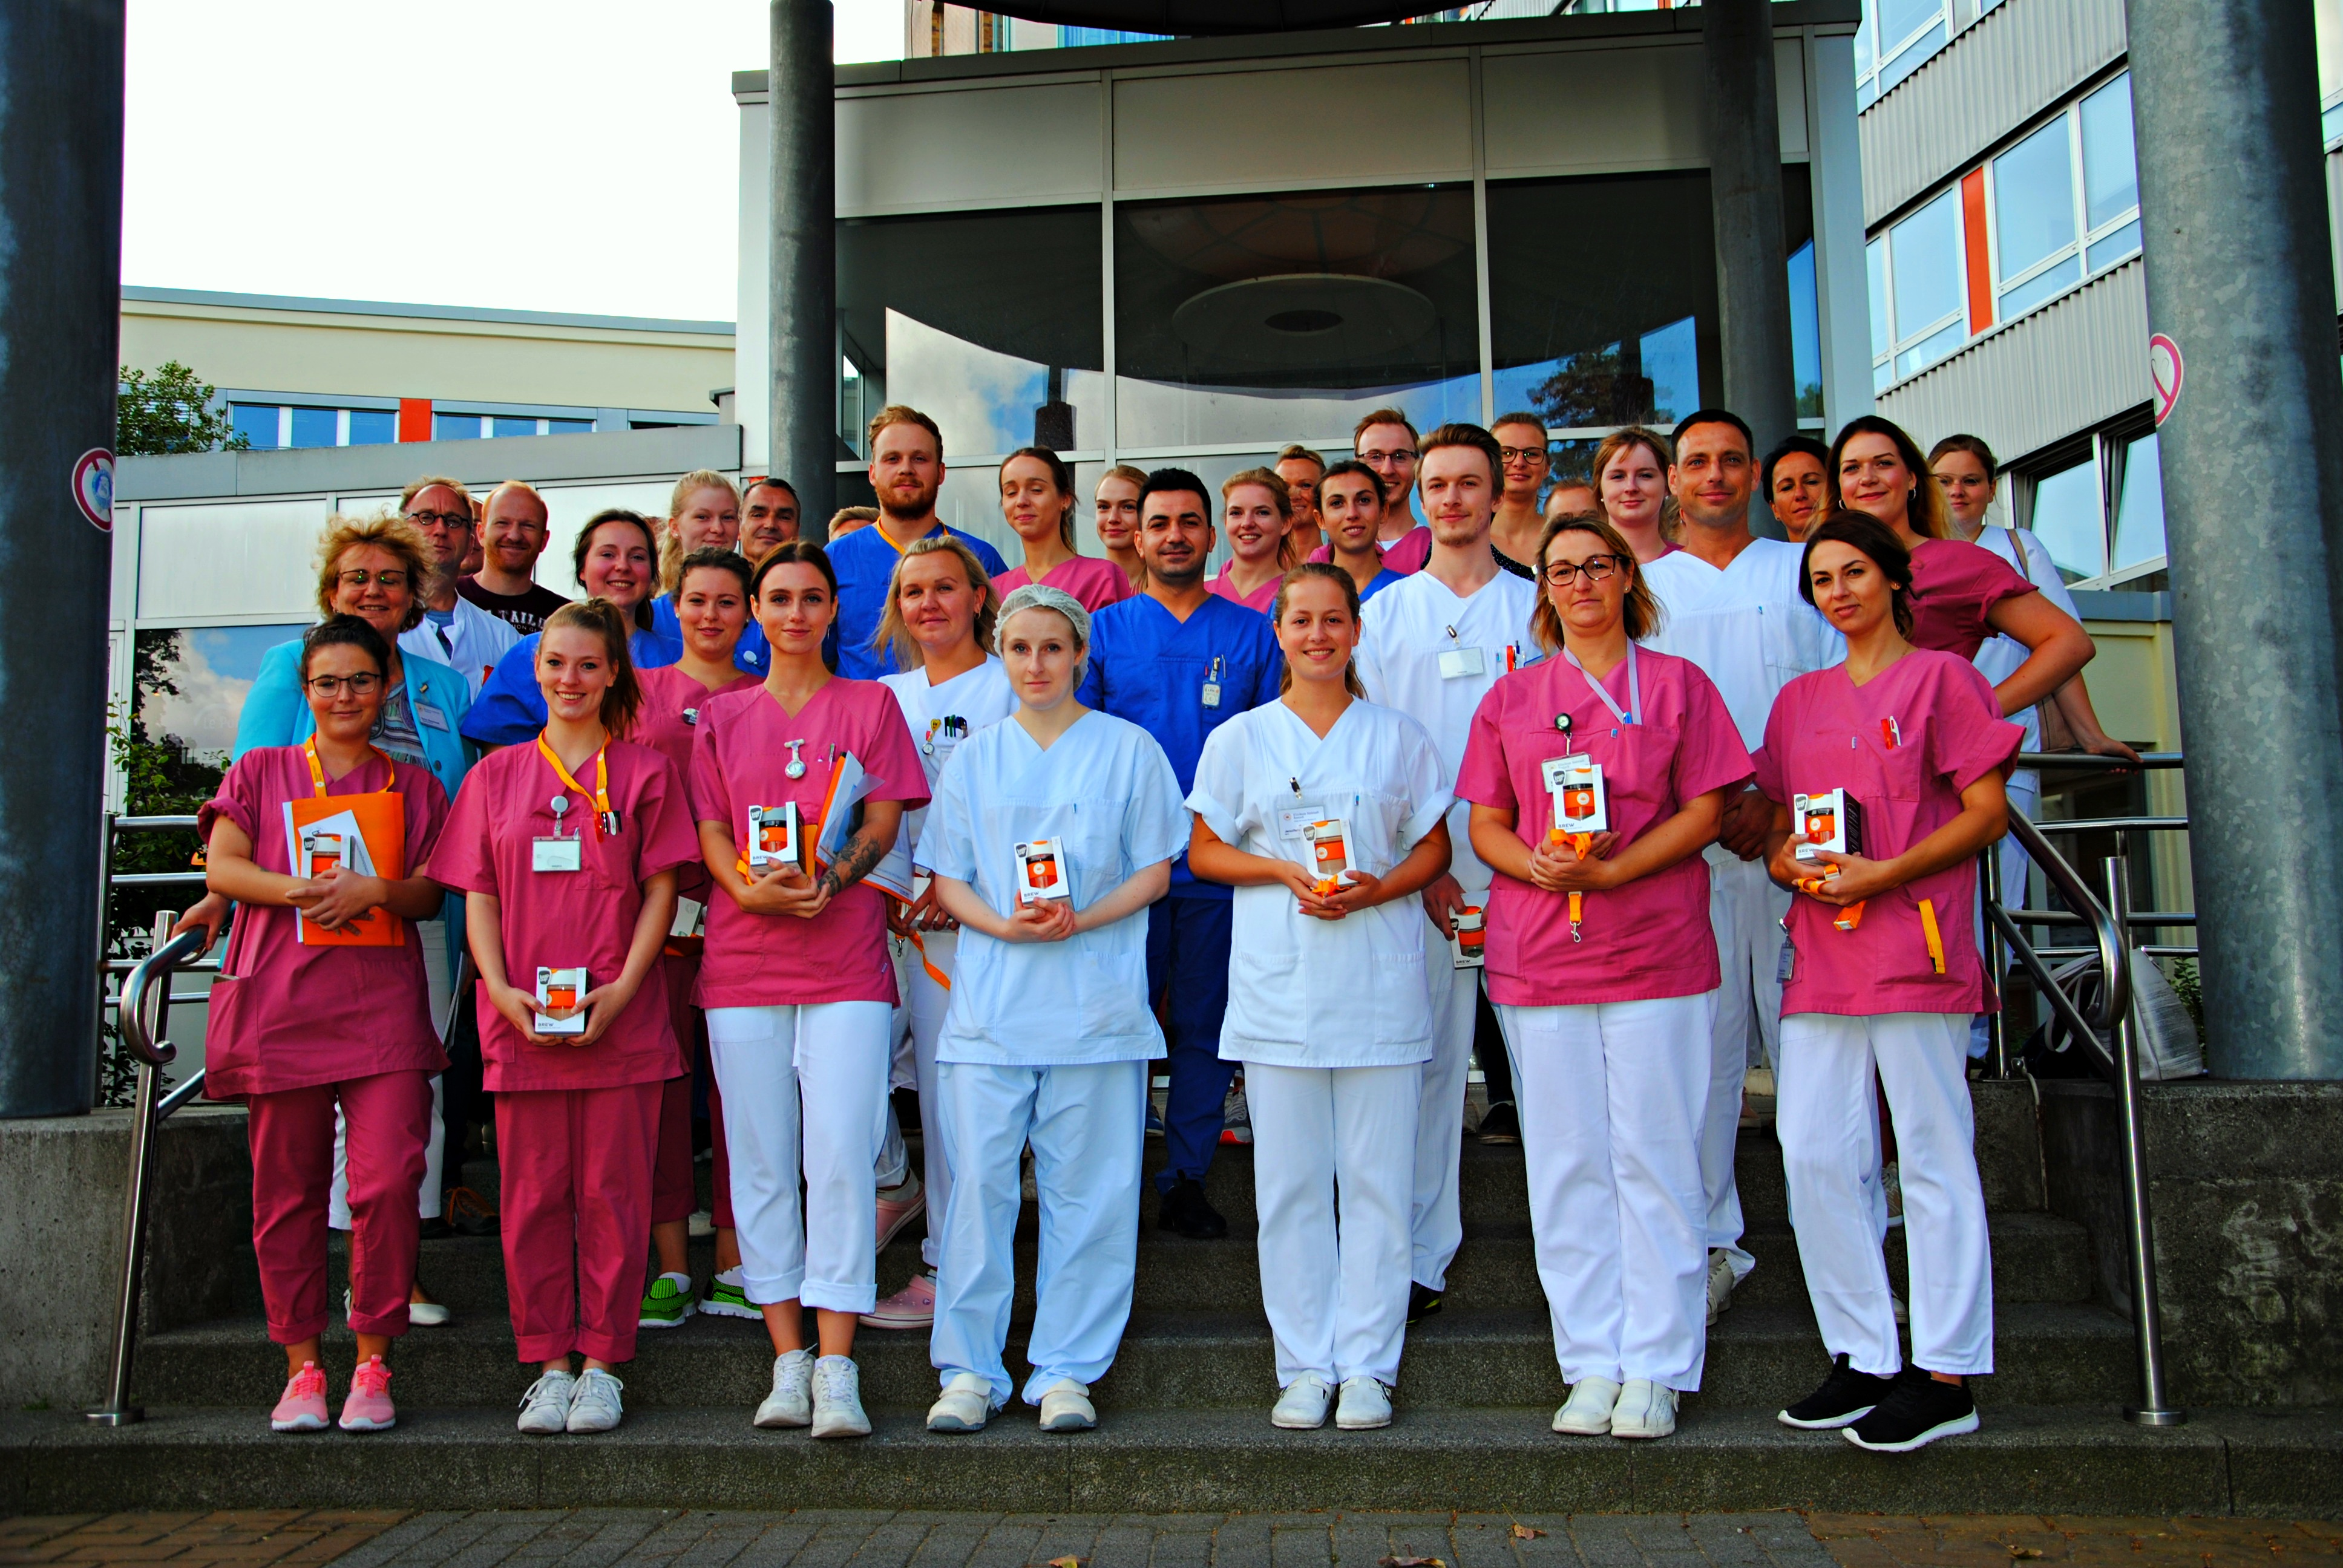 Stellenangebote Südstadtklinikum Rostock